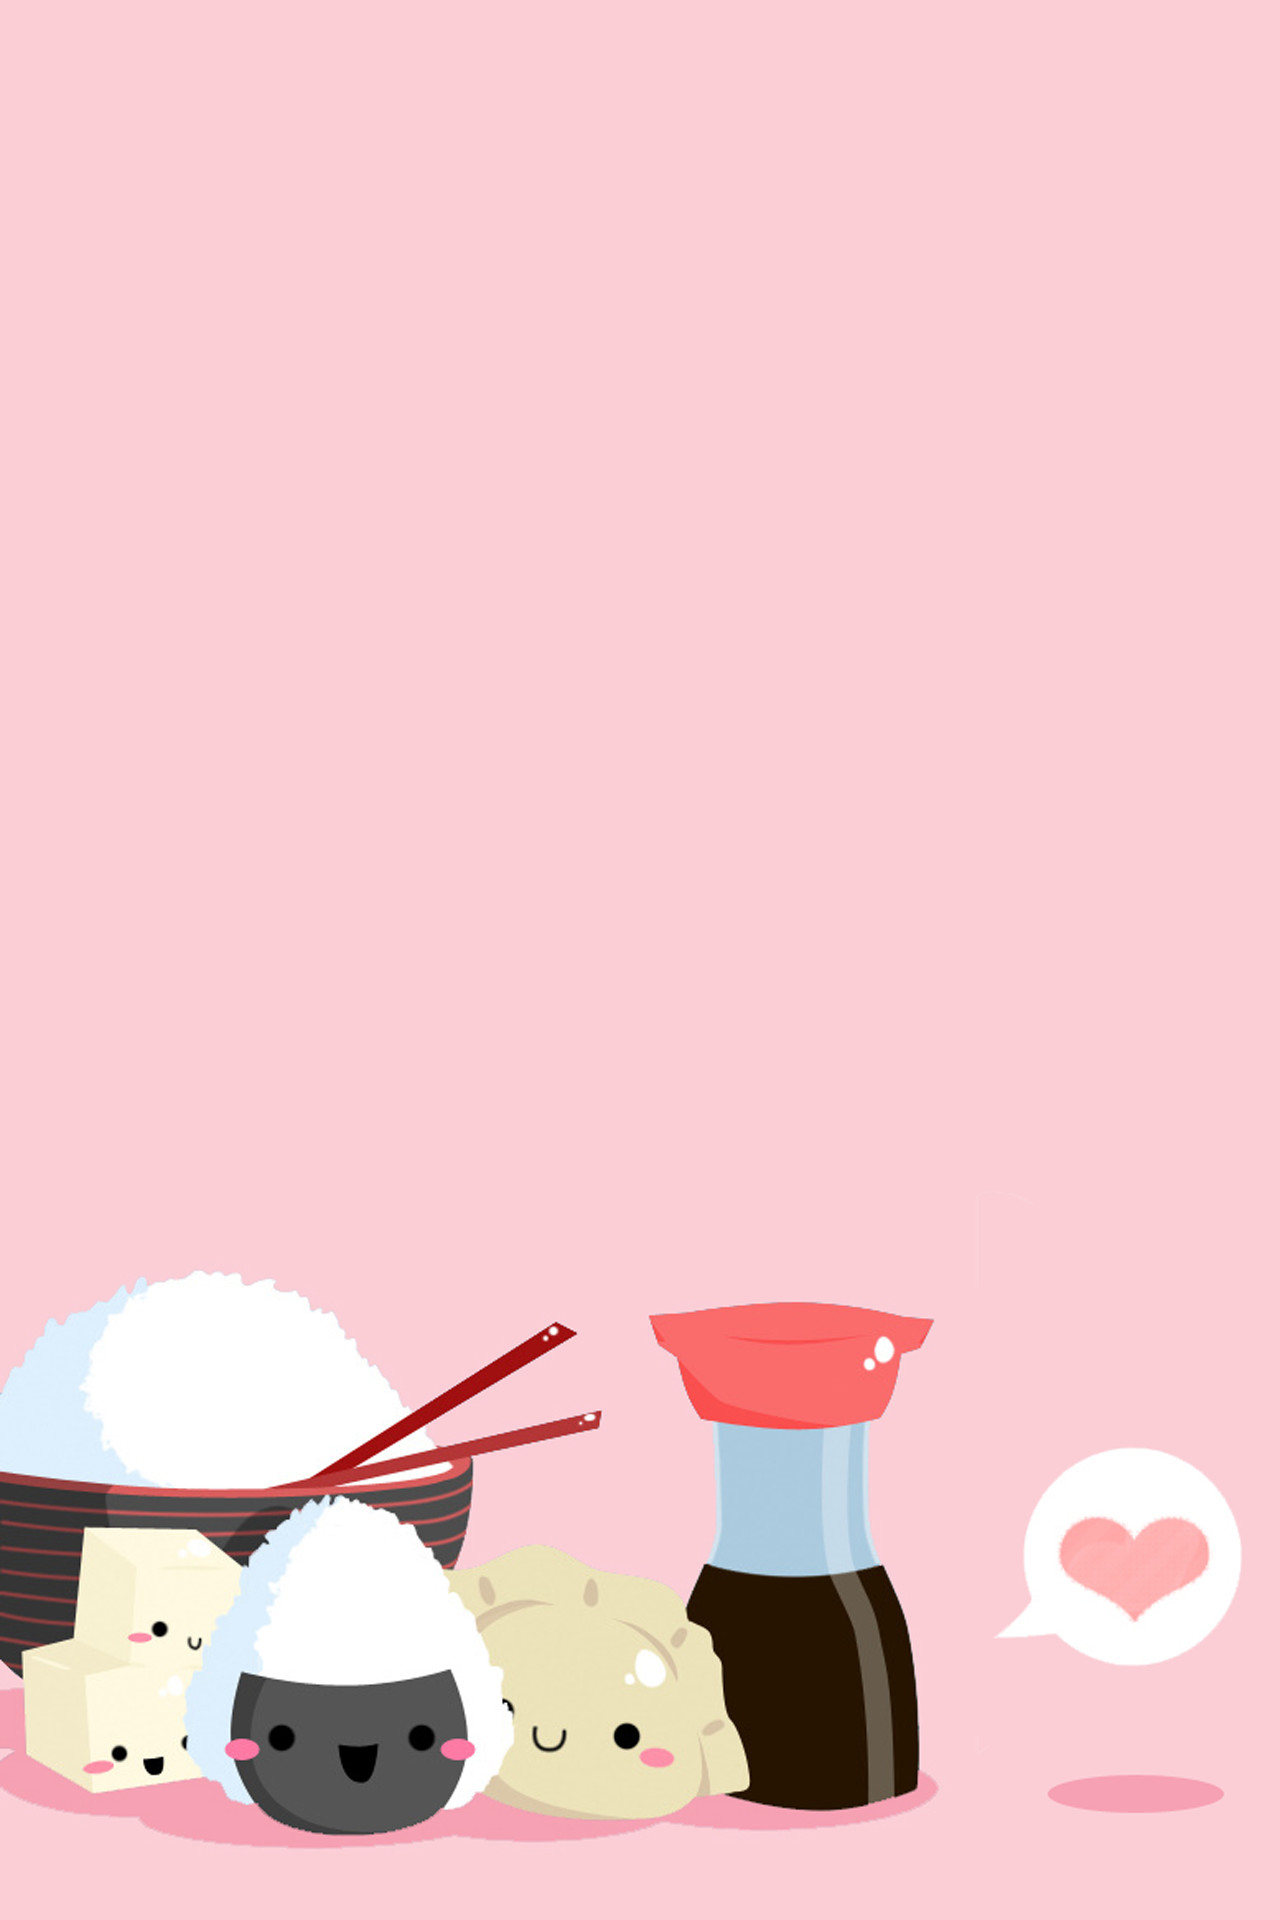 Sushi Kawaii Girly Pink light switch plate bedroom wall art cute Home  Decor. Kawaii WallpaperWallpaper For IphoneKawaii …